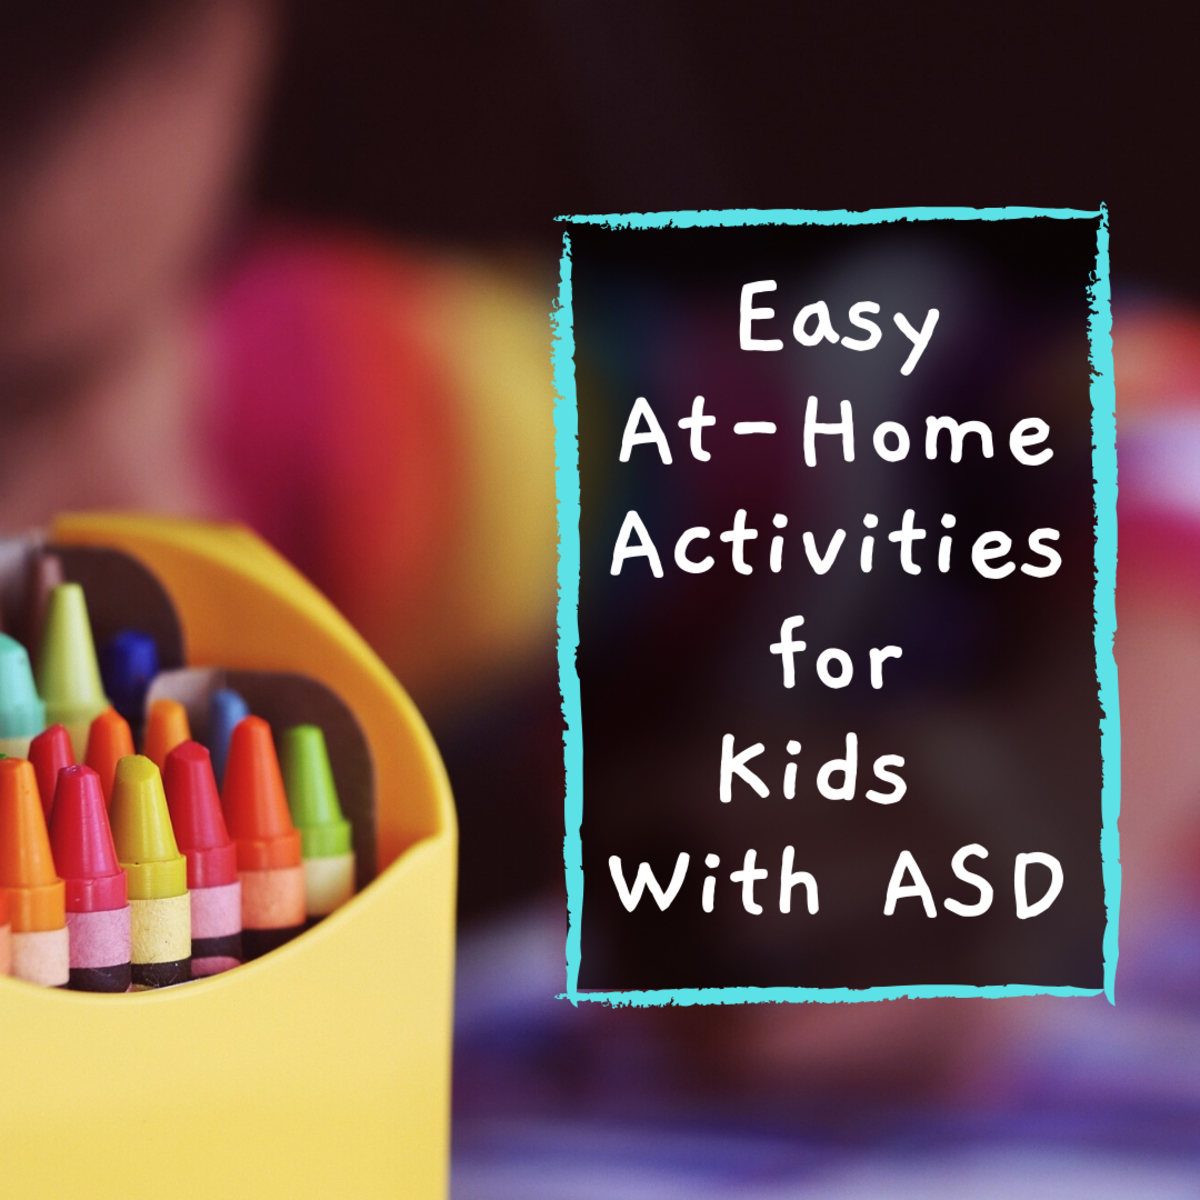 Games and Activities for Preschool Children With Autism